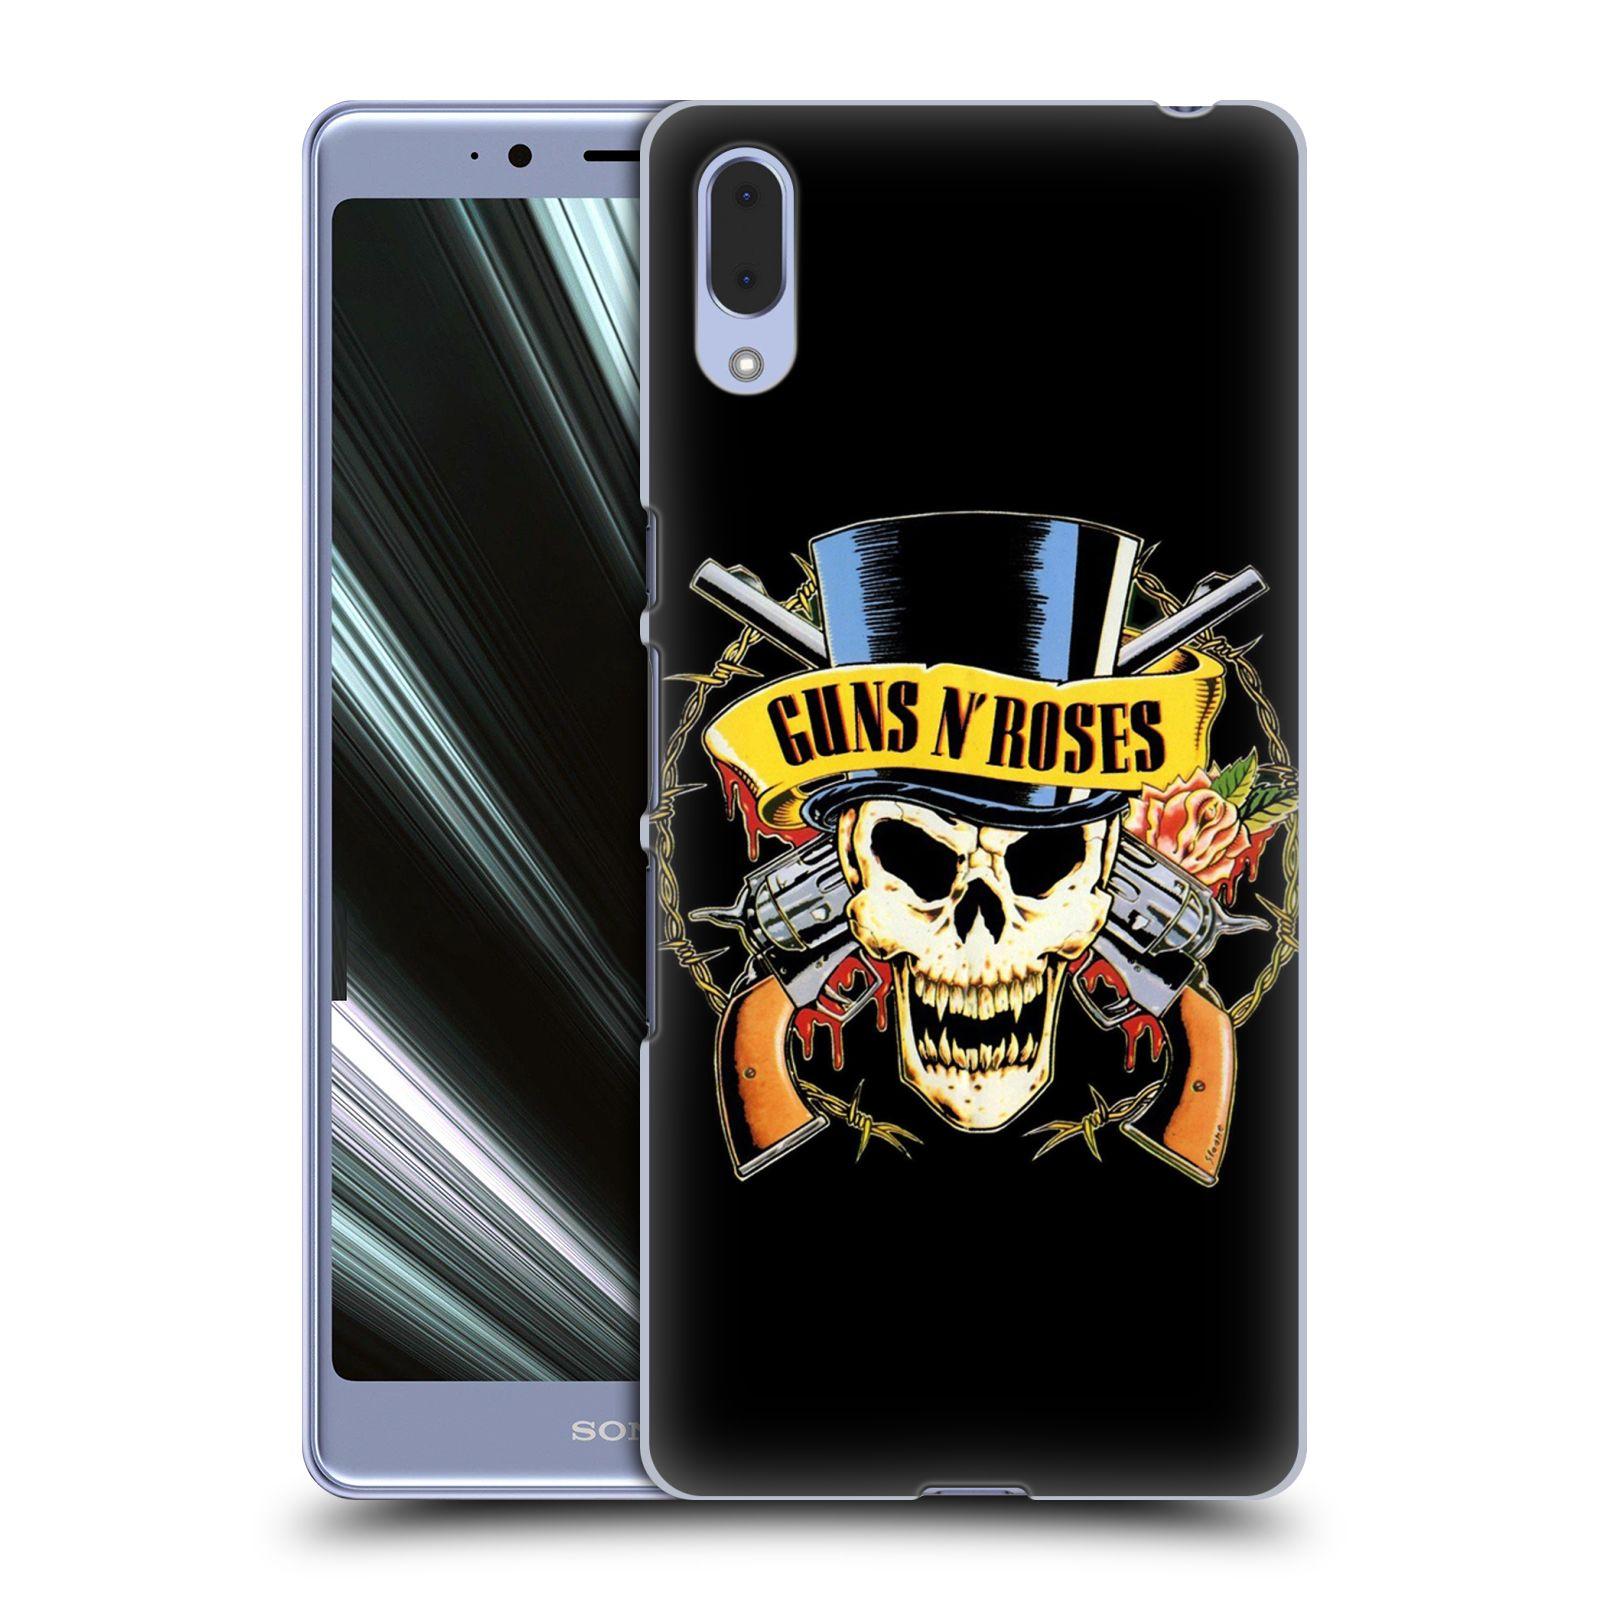 Plastové pouzdro na mobil Sony Xperia L3 - Head Case - Guns N' Roses - Lebka